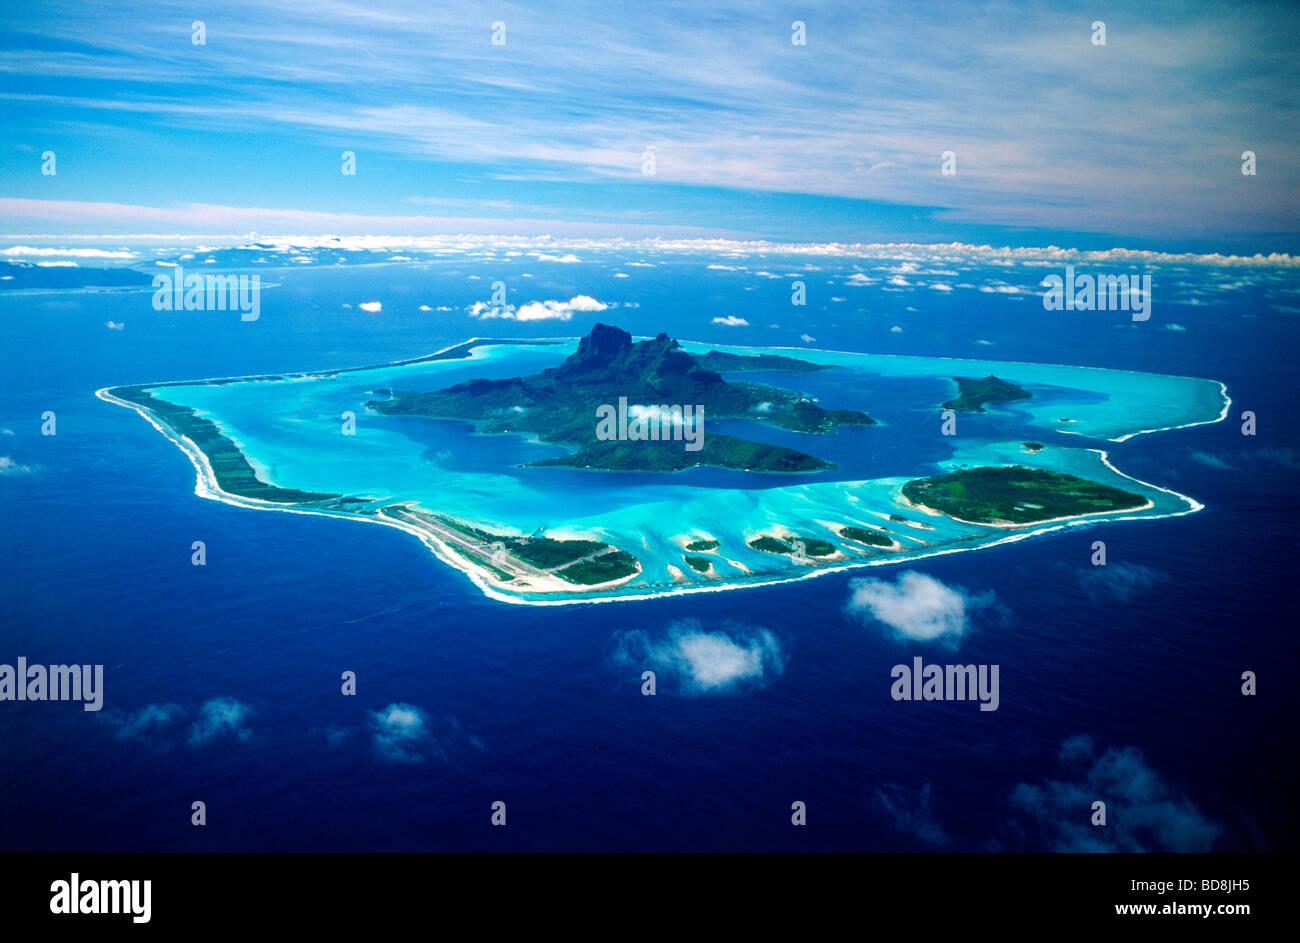 Aerial View Of Bora Bora Island Anchored In Blue South